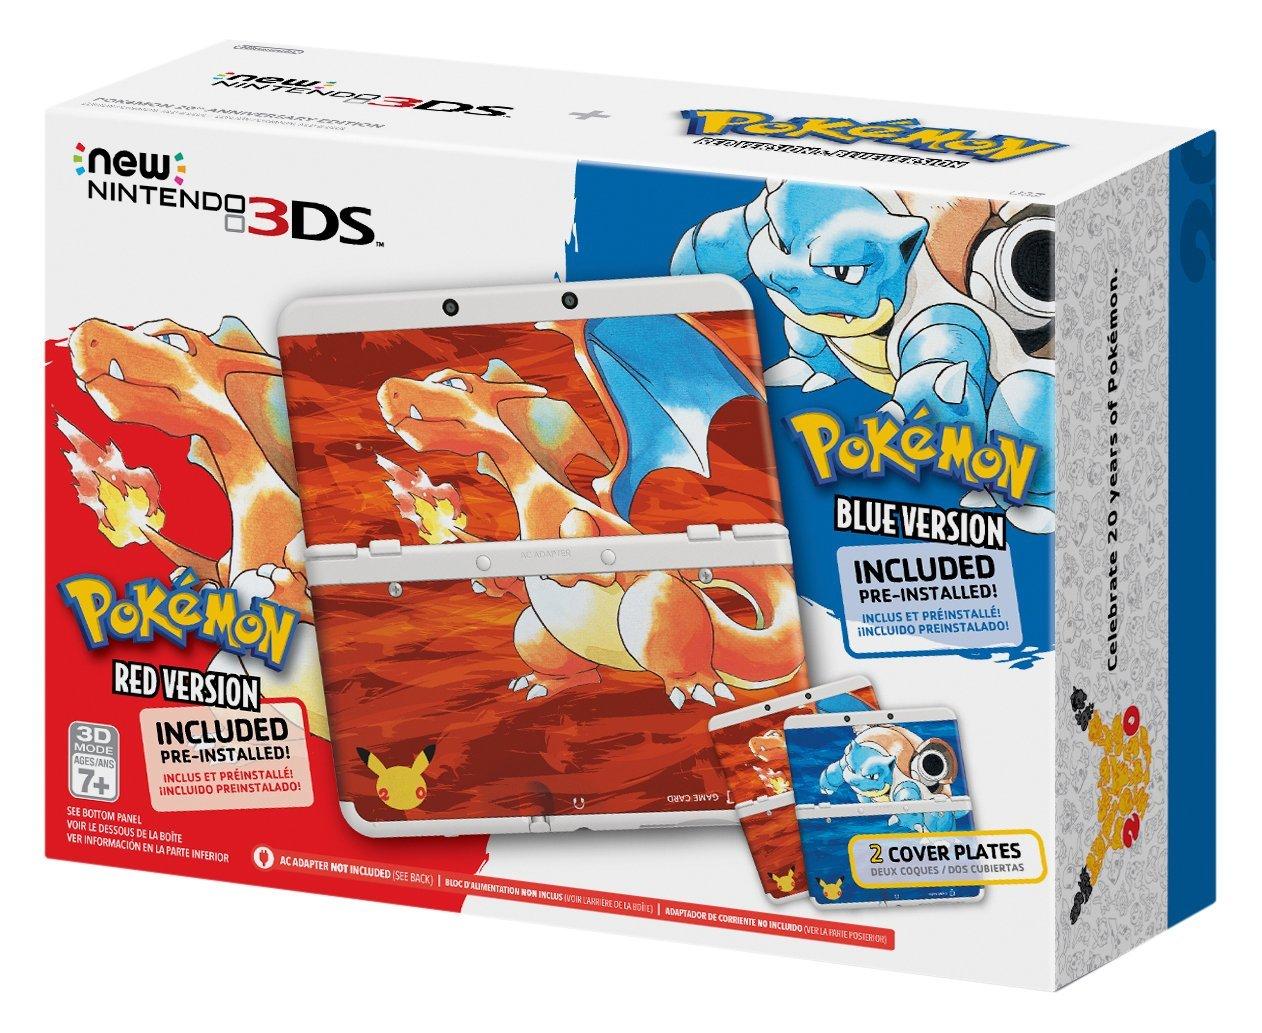 Amazon MX: Preventa Nintendo New 3DS Pokémon 20 aniversario